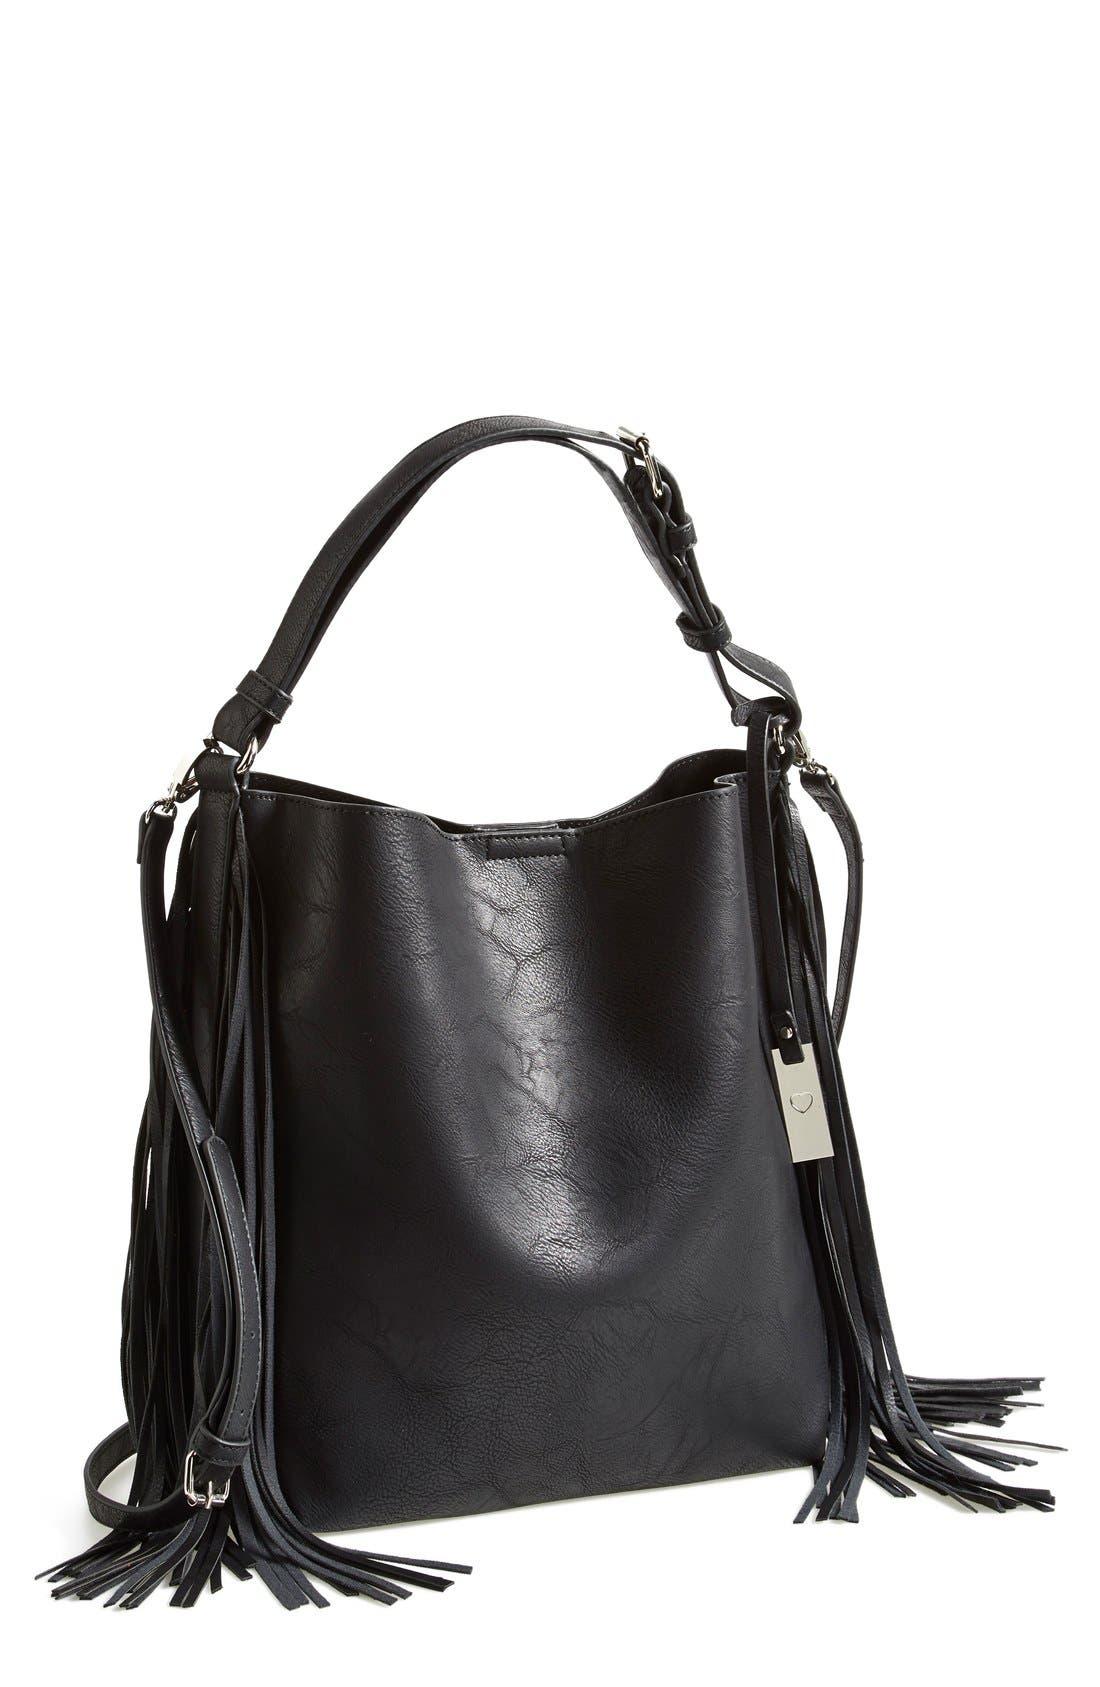 Main Image - Urban Originals 'Avoca' Fringe Shoulder Bag